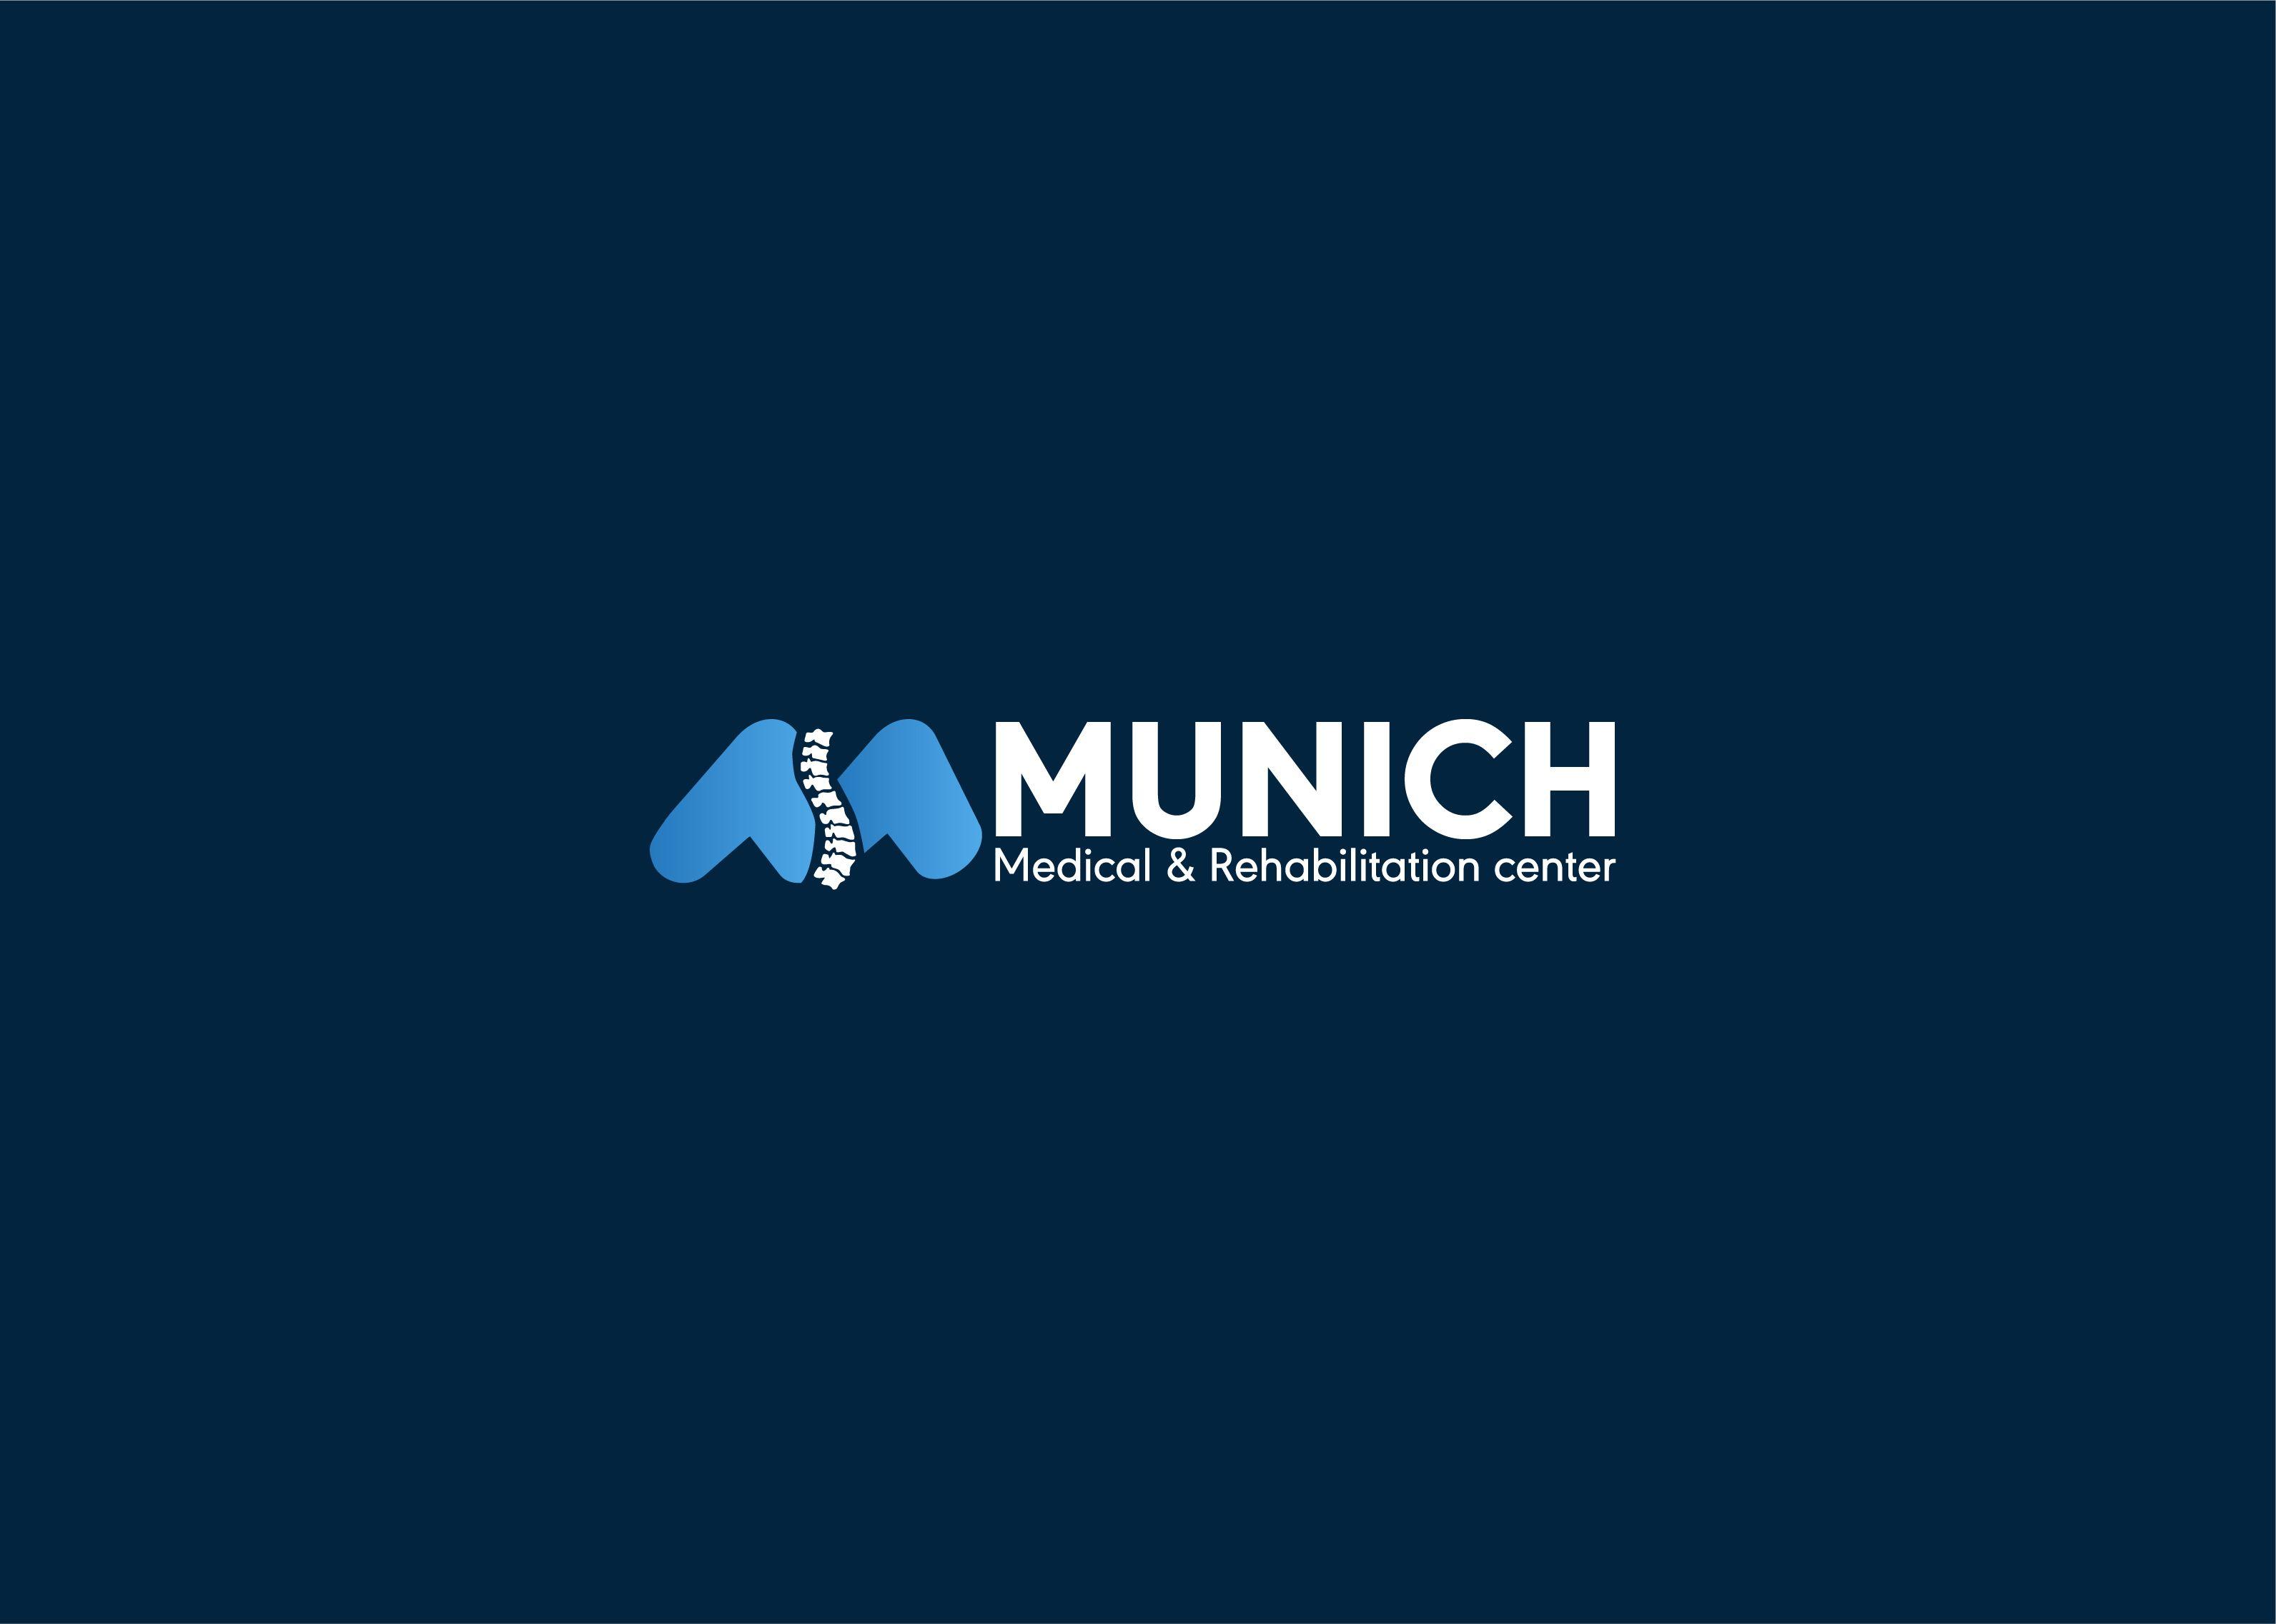 Munich Logo Design For Medical Rehabilitation Center In 2020 Logo Design Rehabilitation Rehabilitation Center